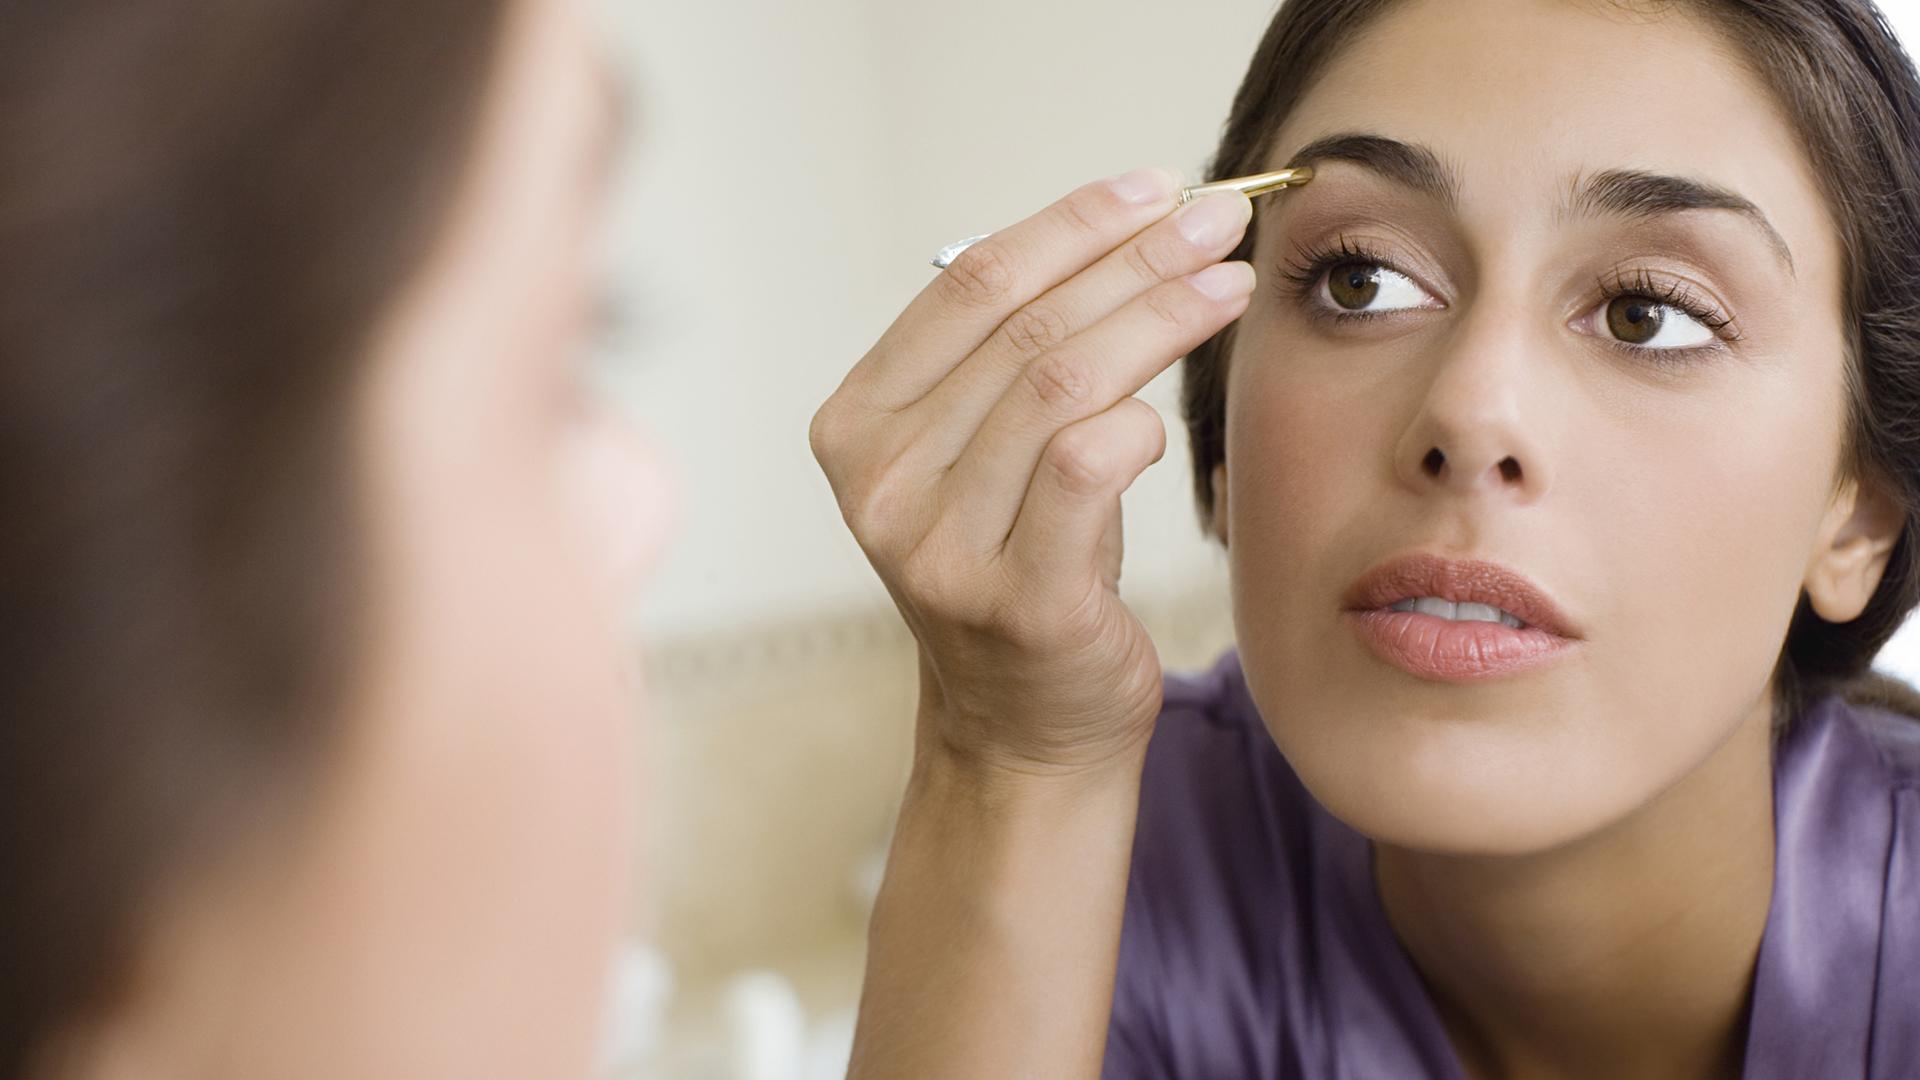 Woman plucking eyebrows   Sheknowws.ca